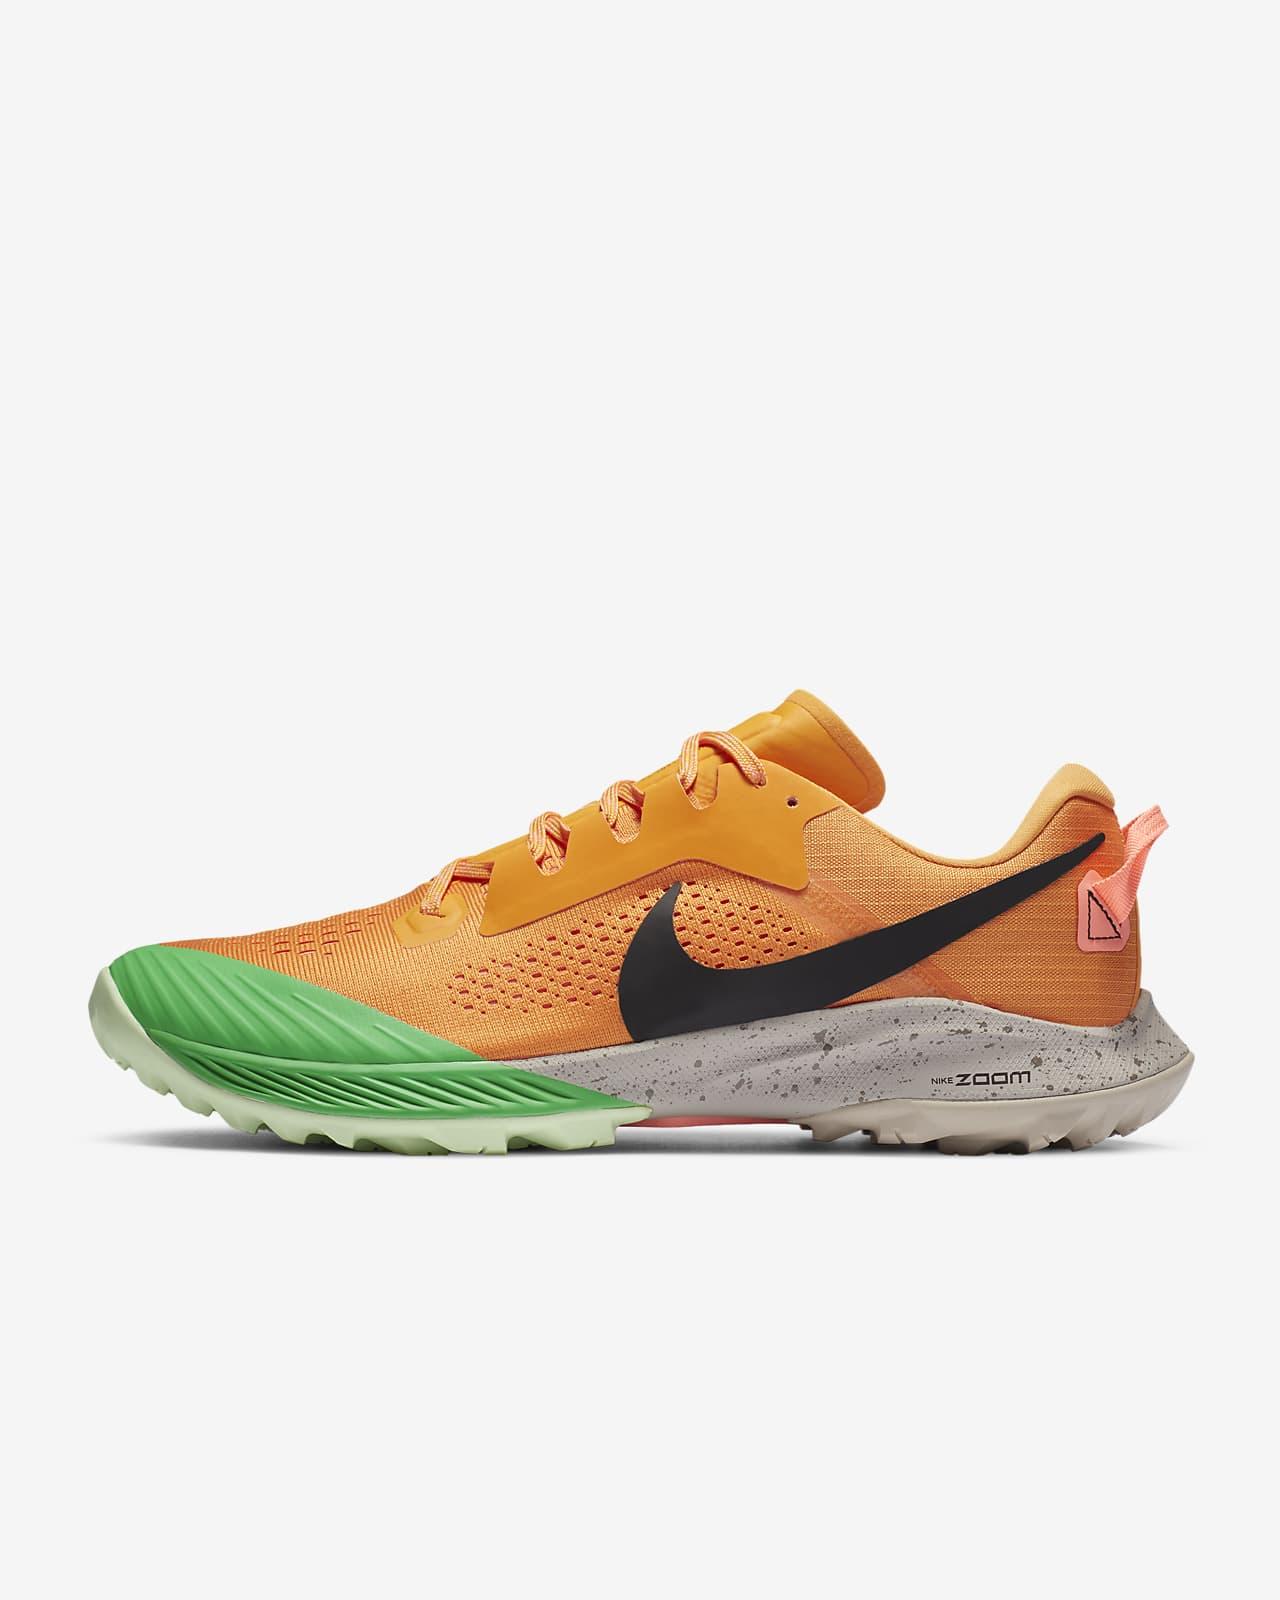 Nike Air Zoom Terra Kiger 6 Zapatillas de trail running - Hombre